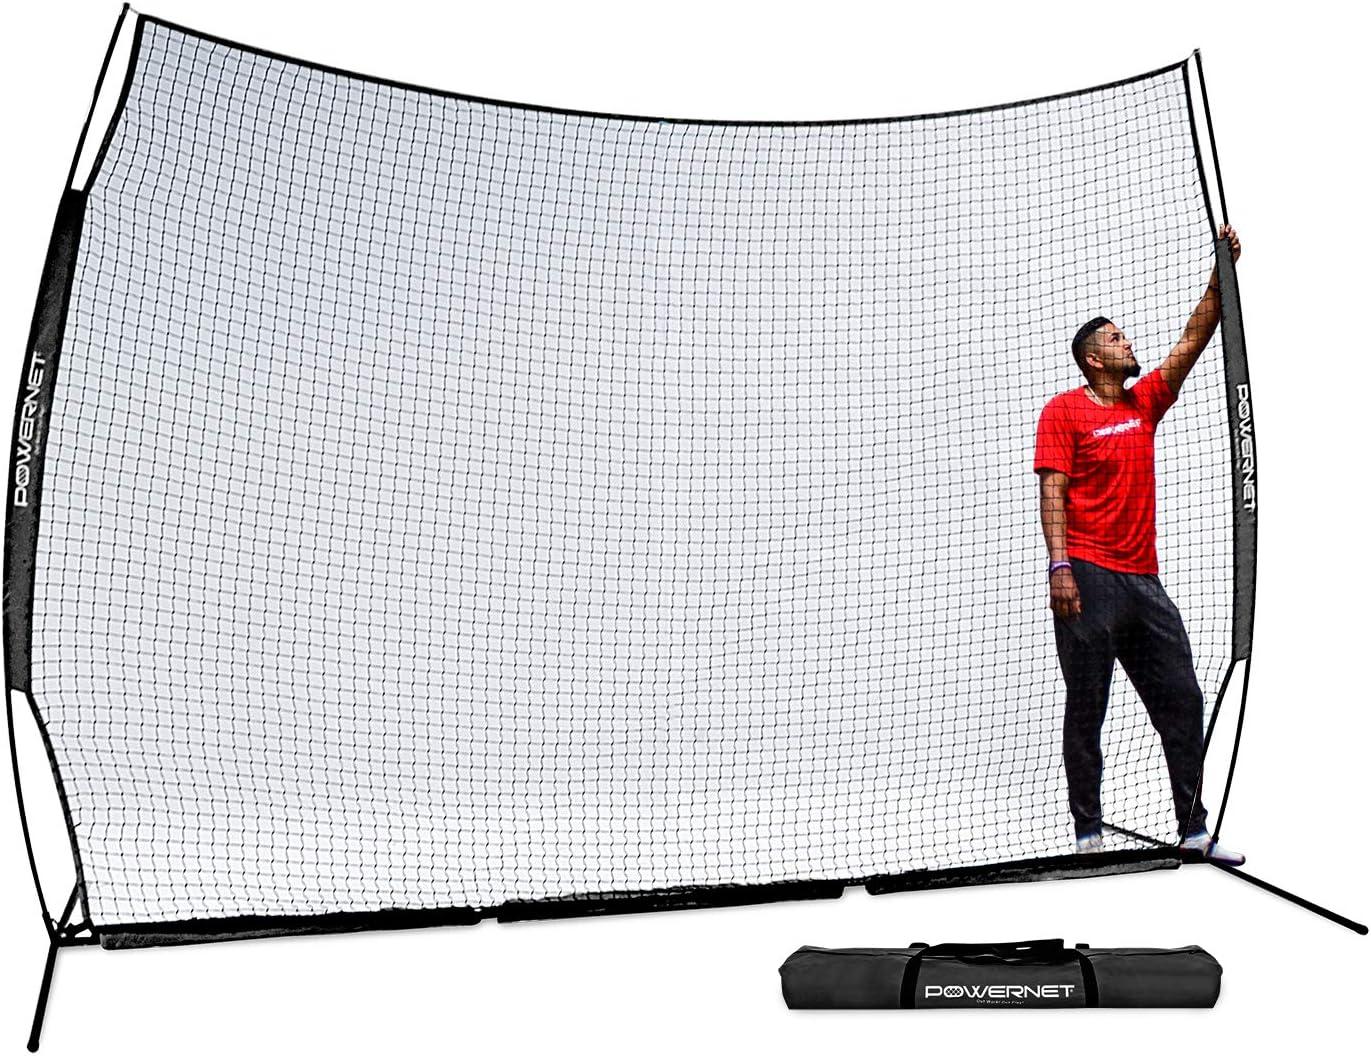 PowerNet 12 ft x 9 ft Sports Barrier Net 108 SqFt of Protection Safety Backstop Portable EZ Setup Barricade for Baseball, Lacrosse, Basketball, Soccer, Field Hockey, Softball